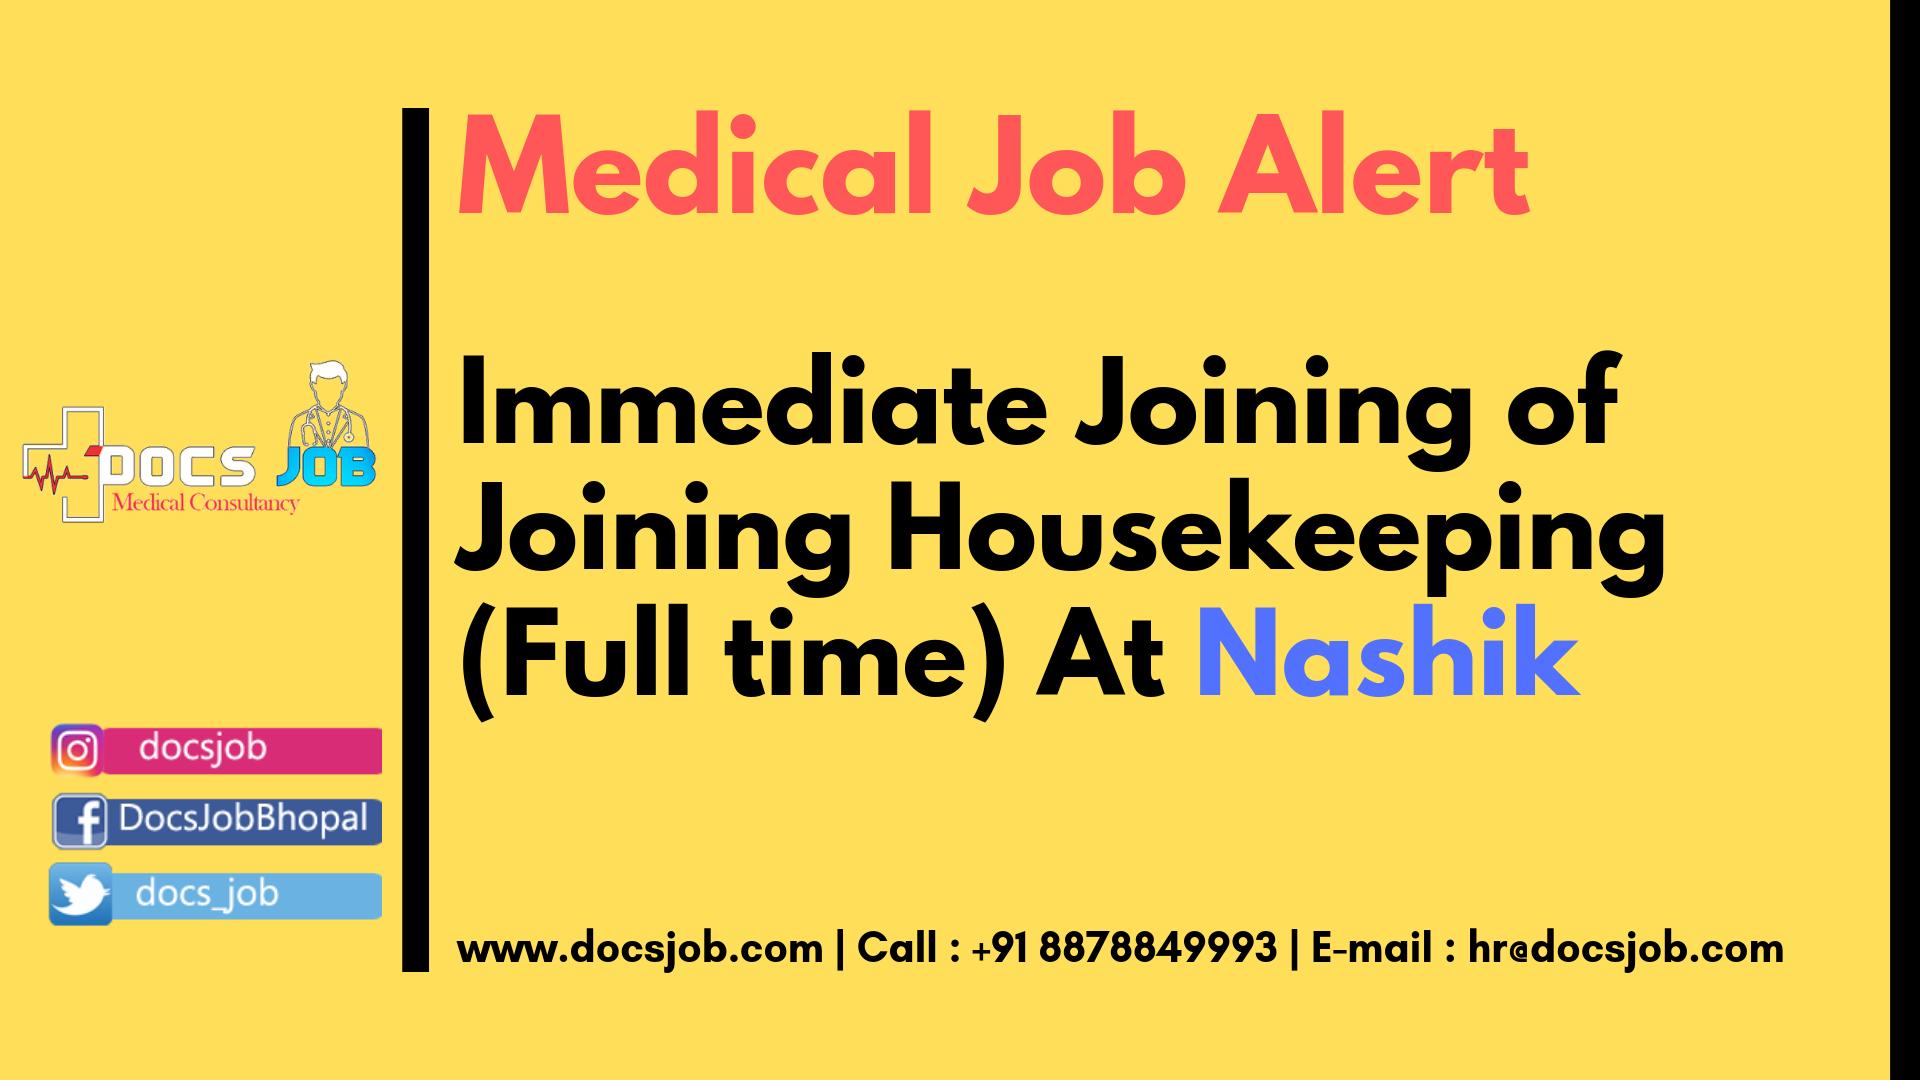 Pin by Docs Job on Medical Jobs Medical jobs, Hospital